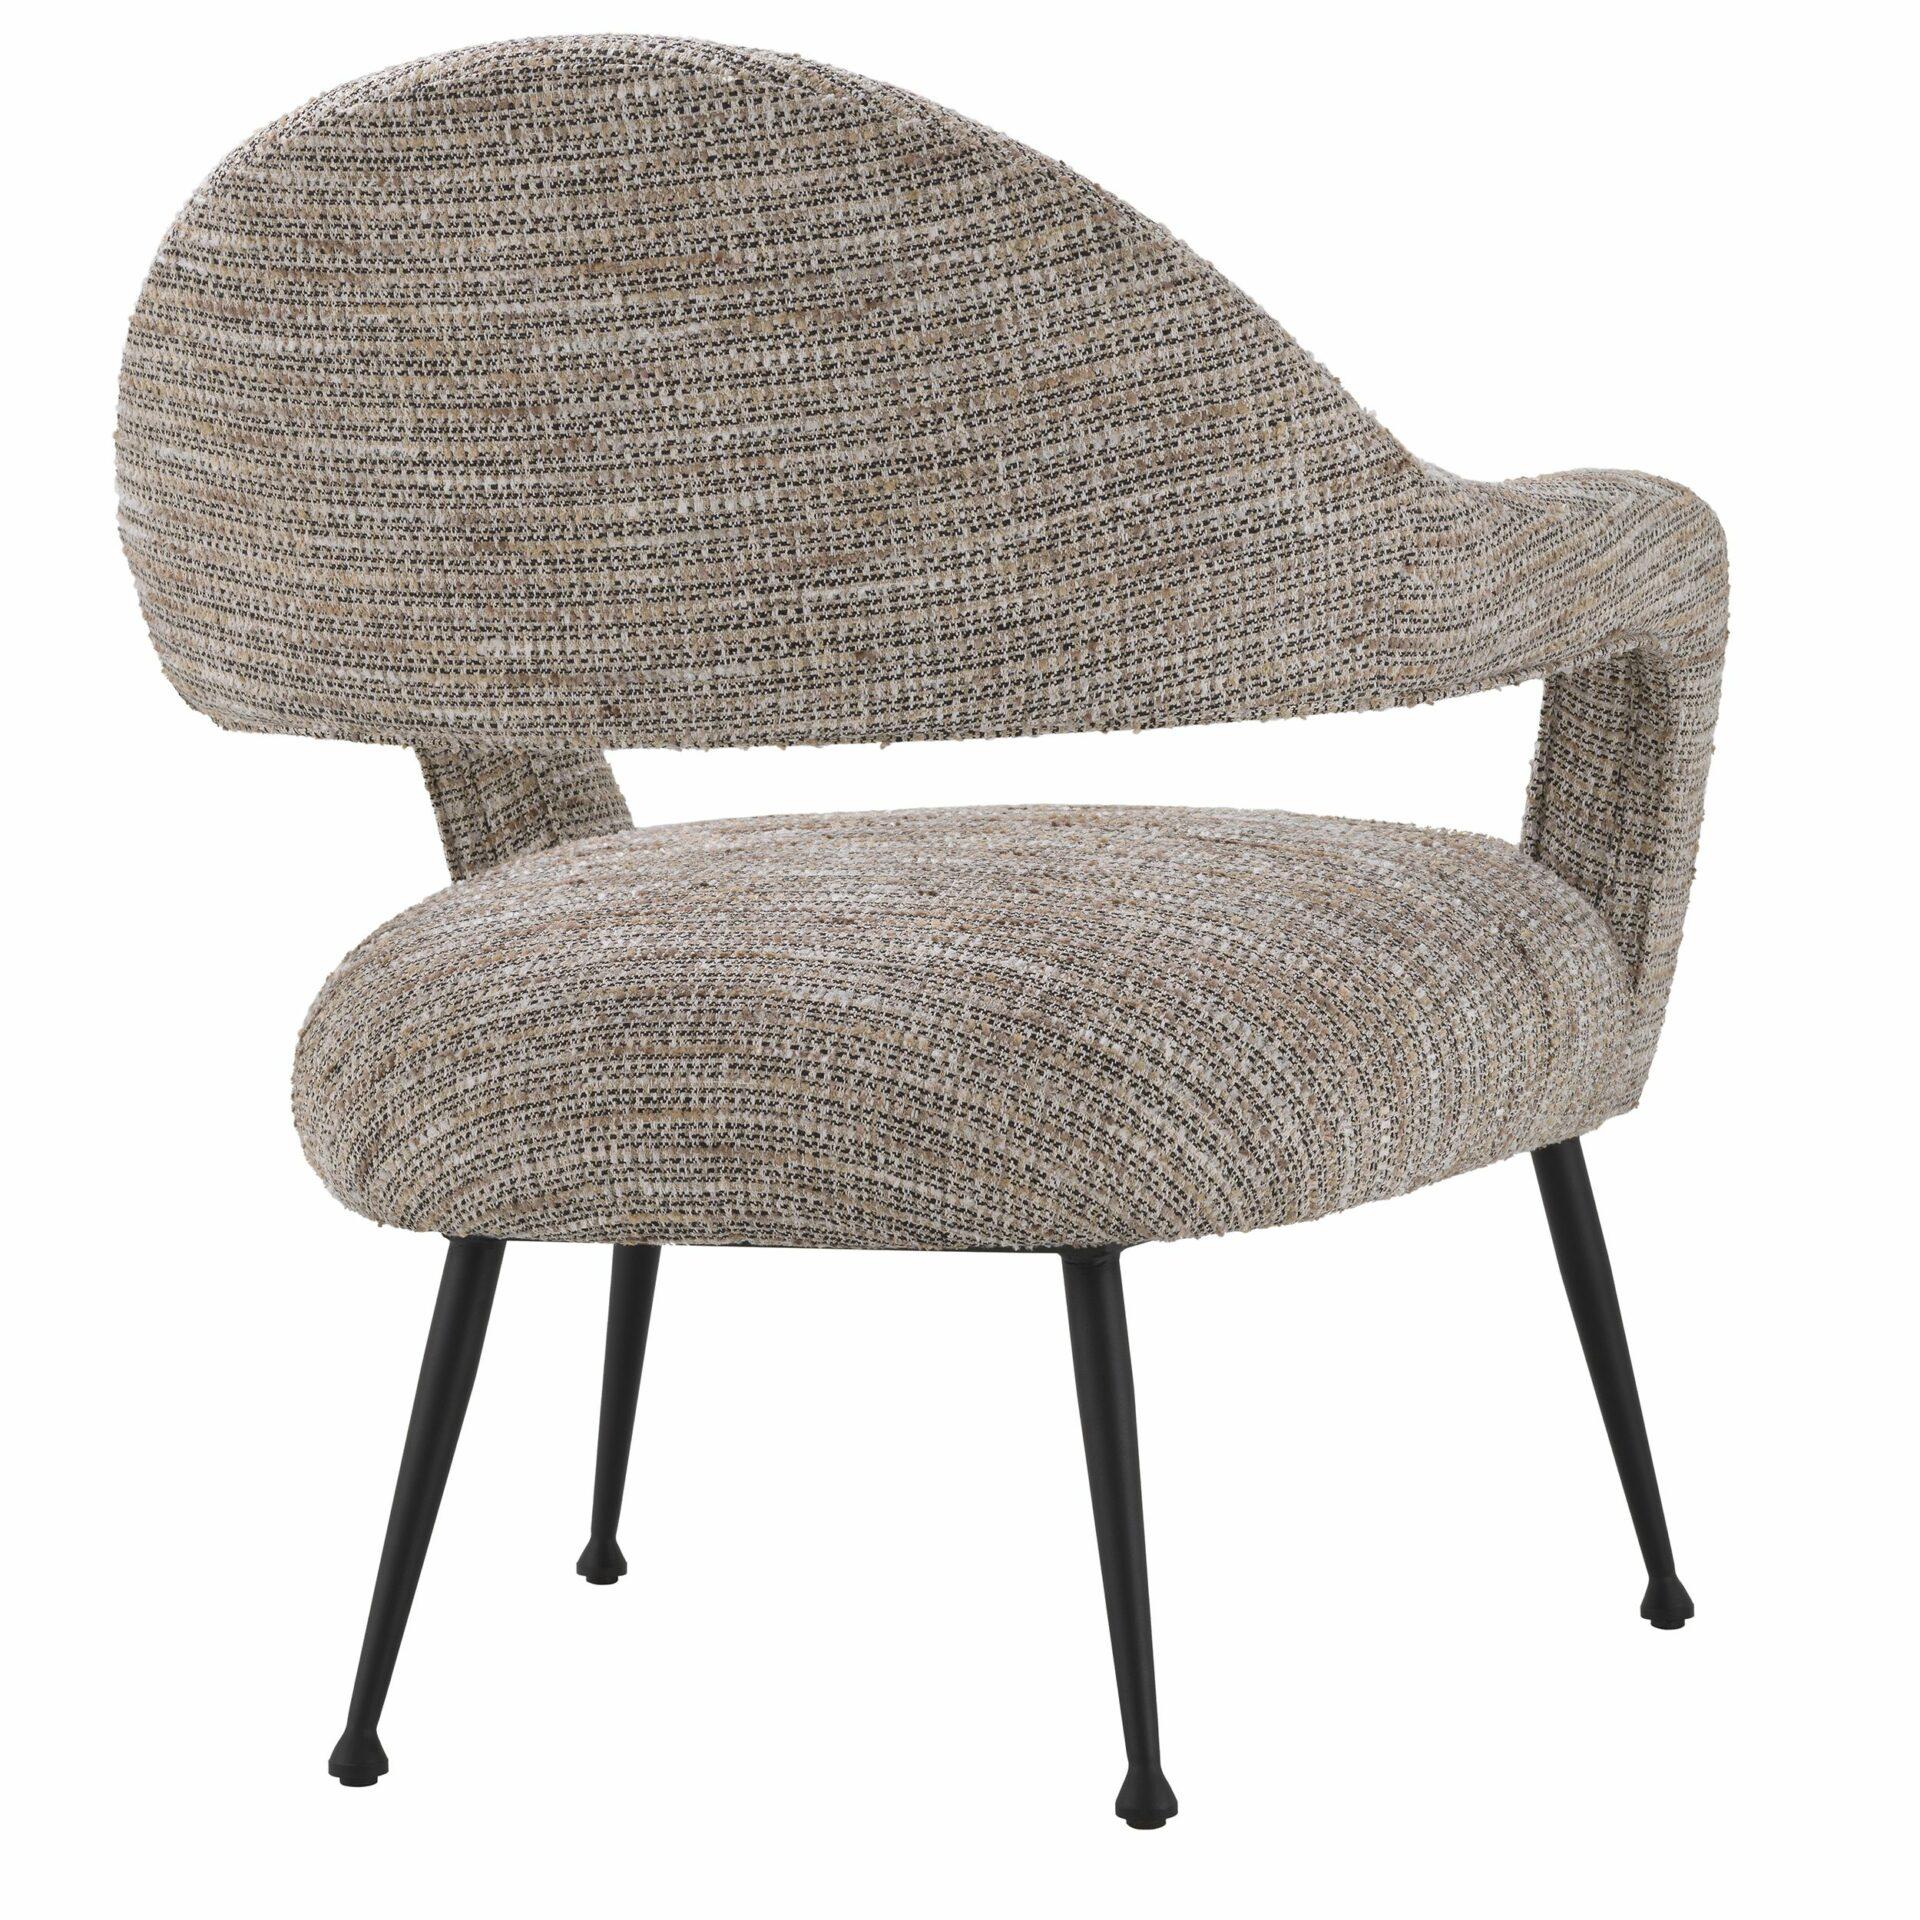 eichholtz-chair-lombardi-2